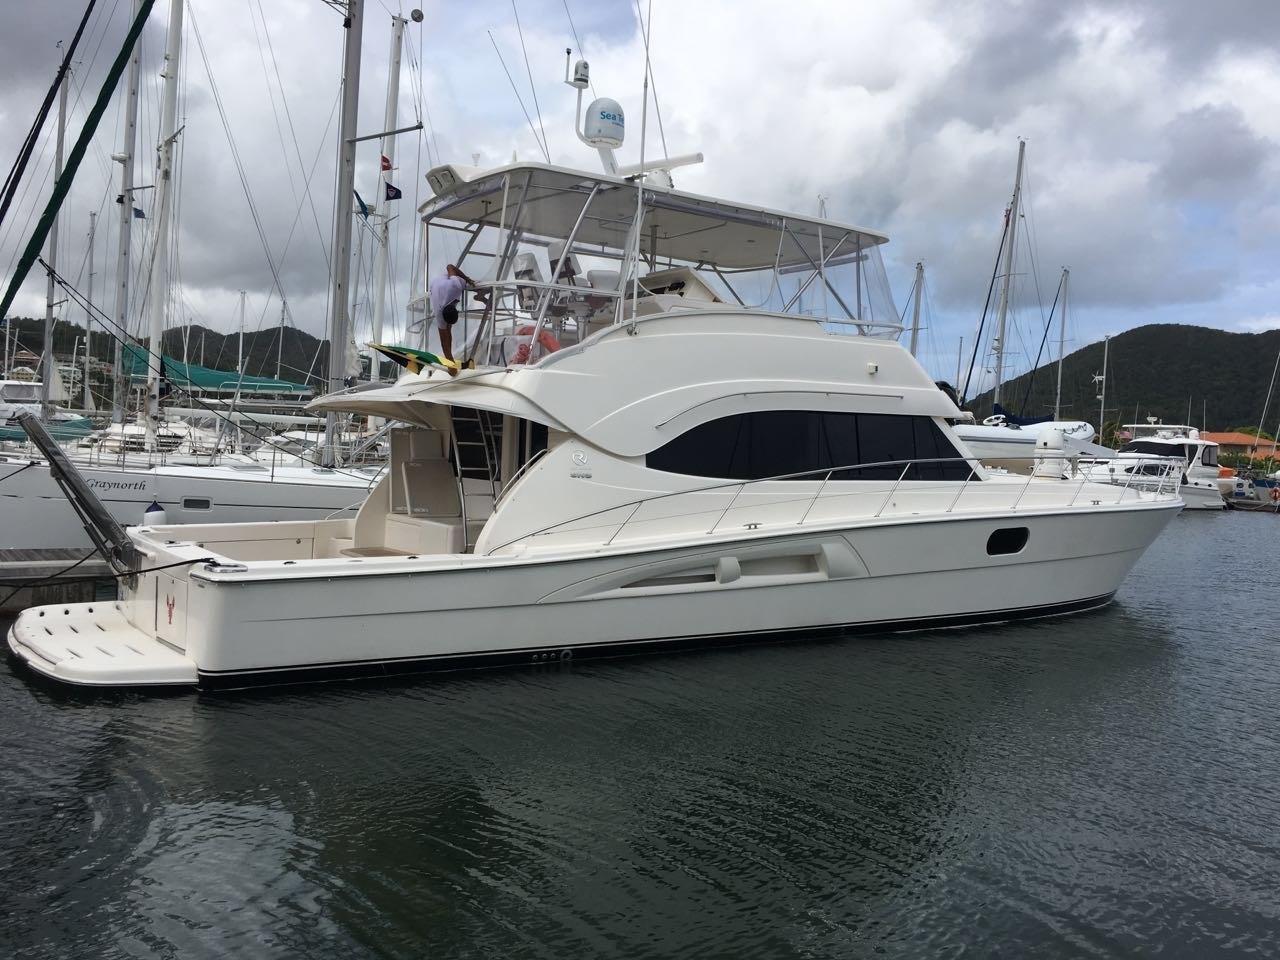 58' Riviera Flybridge Motor Yacht CRISTHI